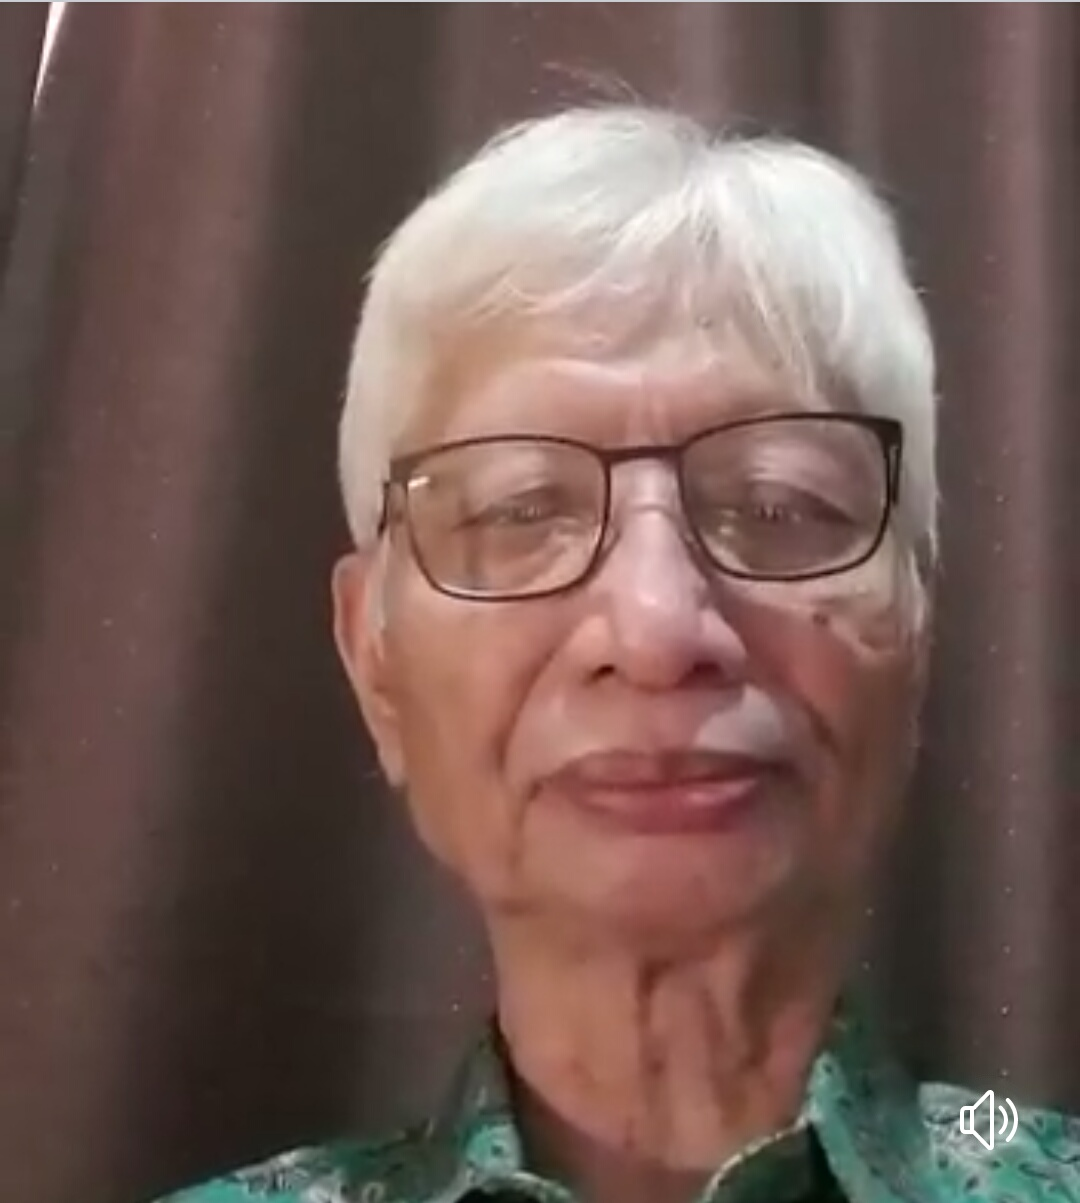 DPP KKS Himbau Warga Soppeng Diperantauan Tidak Pulang Kampung  di Masa Pandemi Covid 19